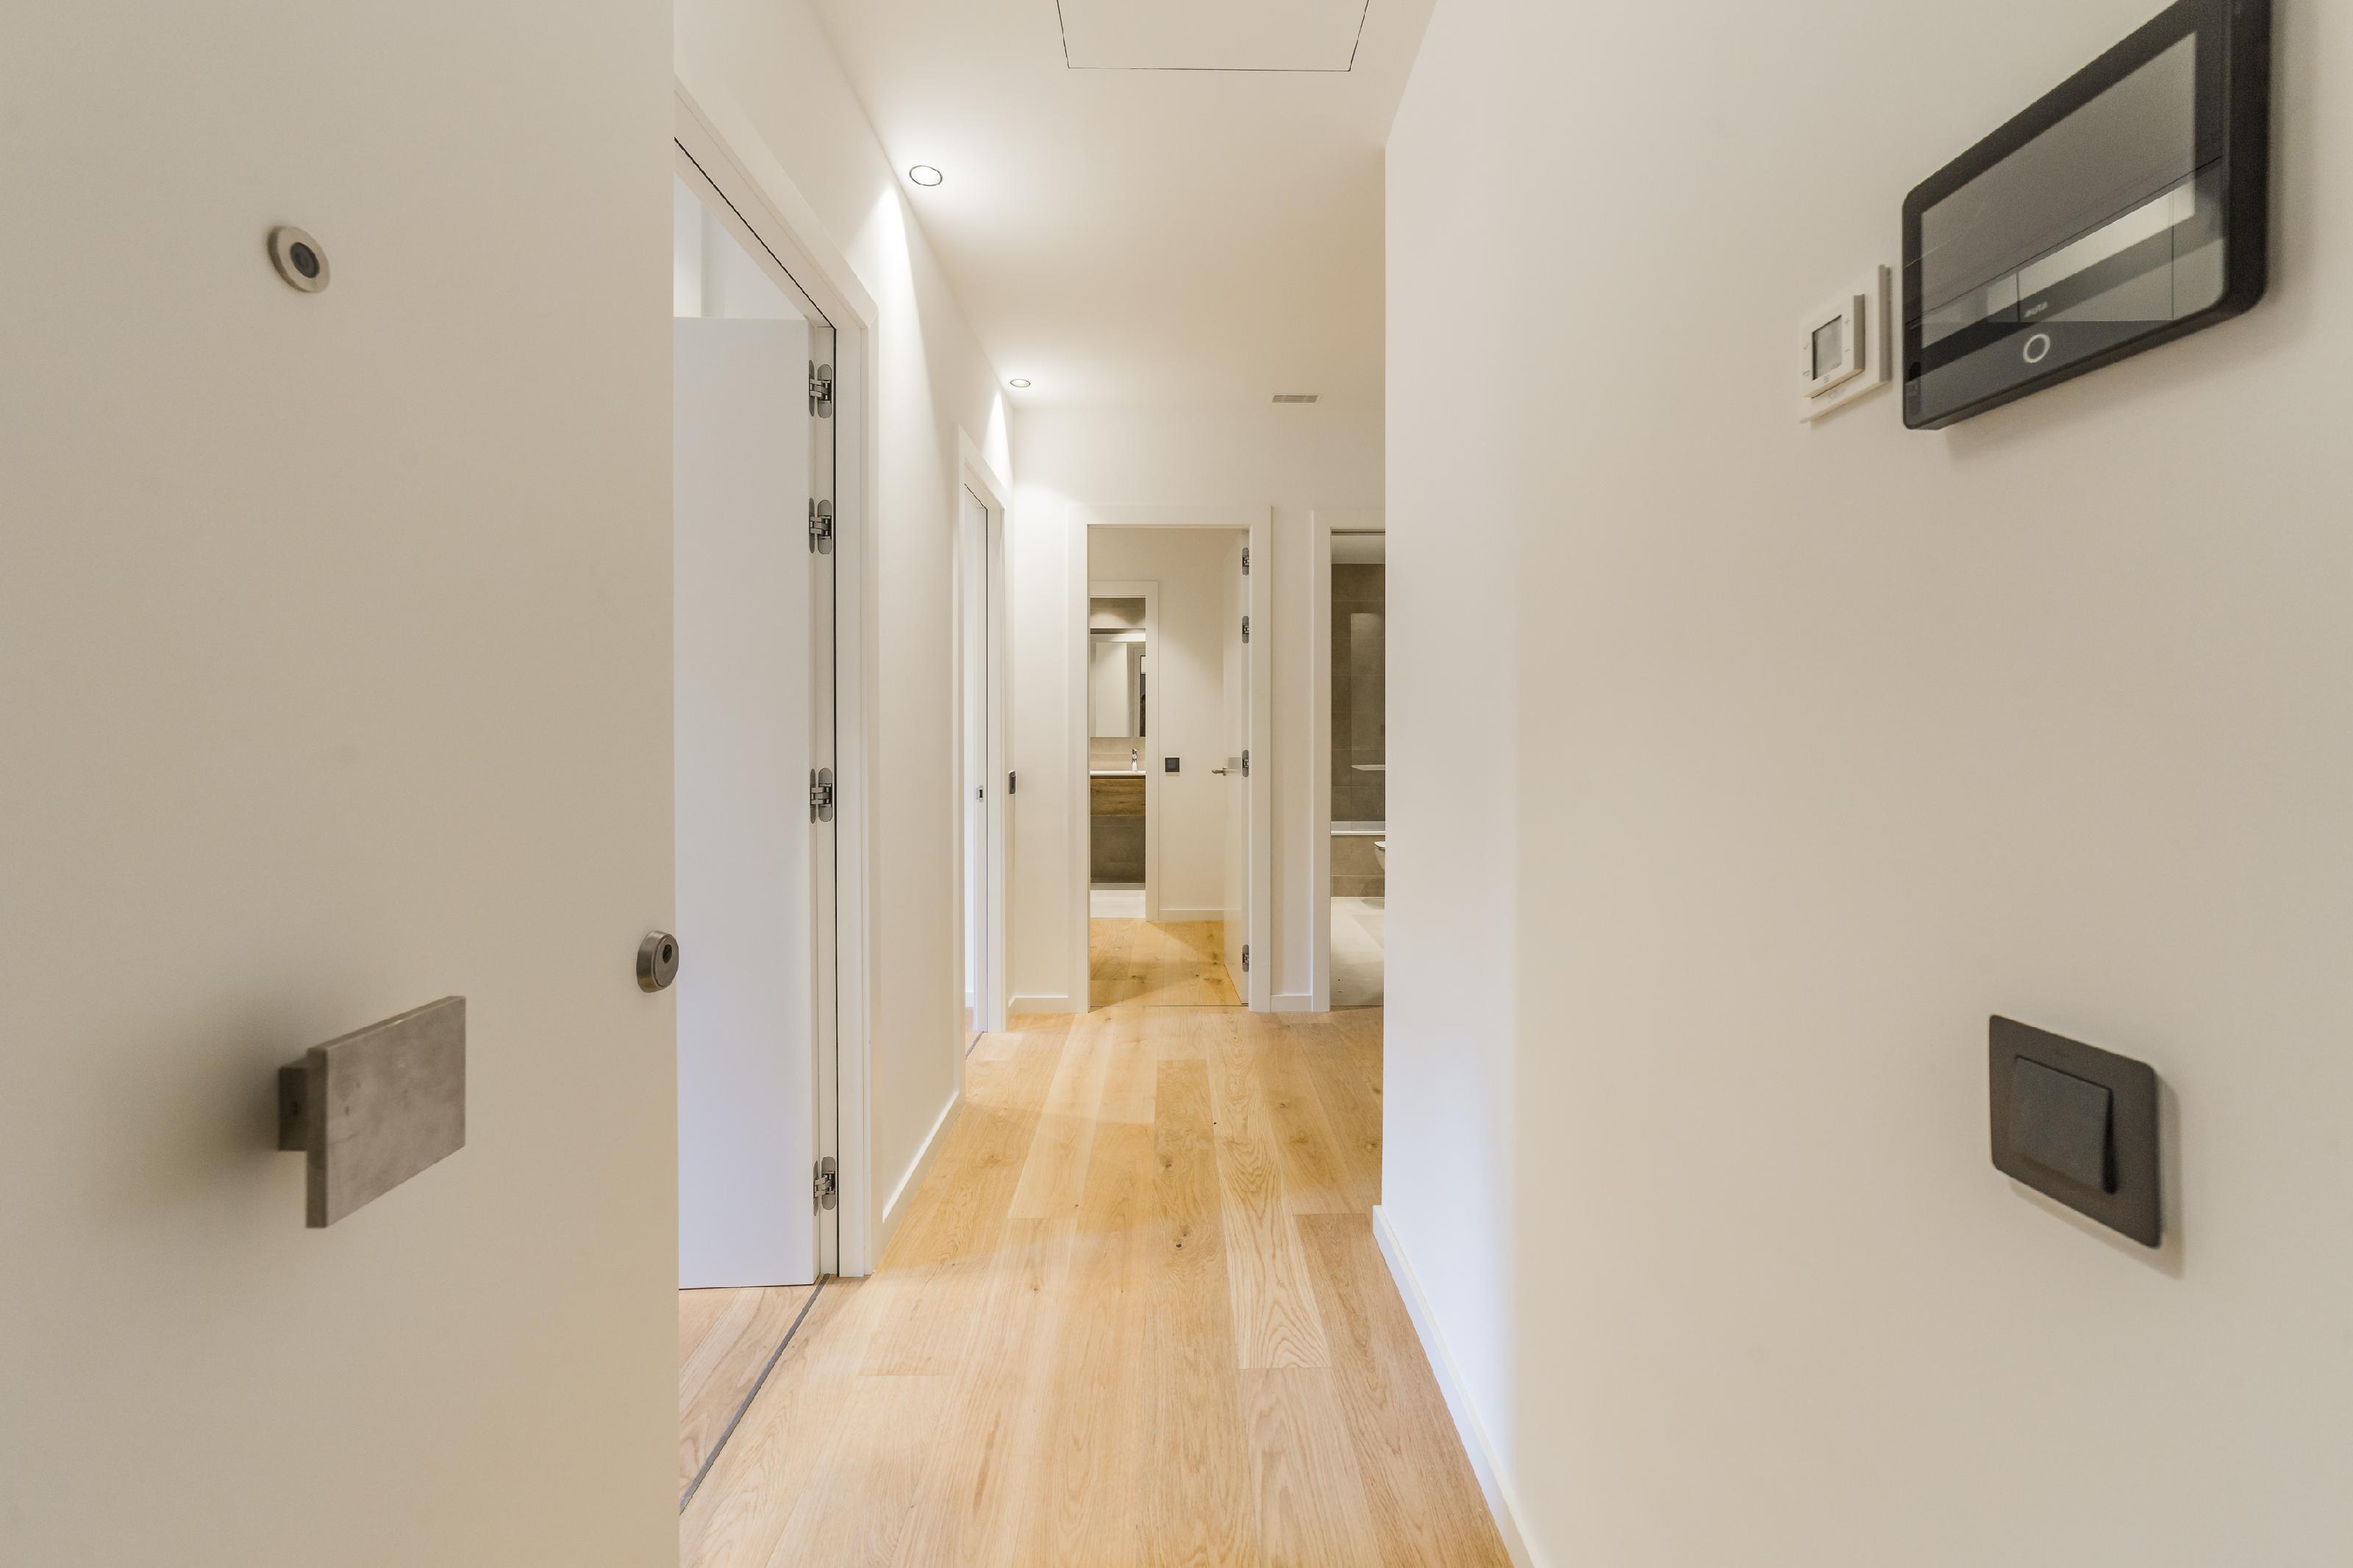 182456 Apartamento en venda en Eixample, Antiga Esquerre Eixample 7